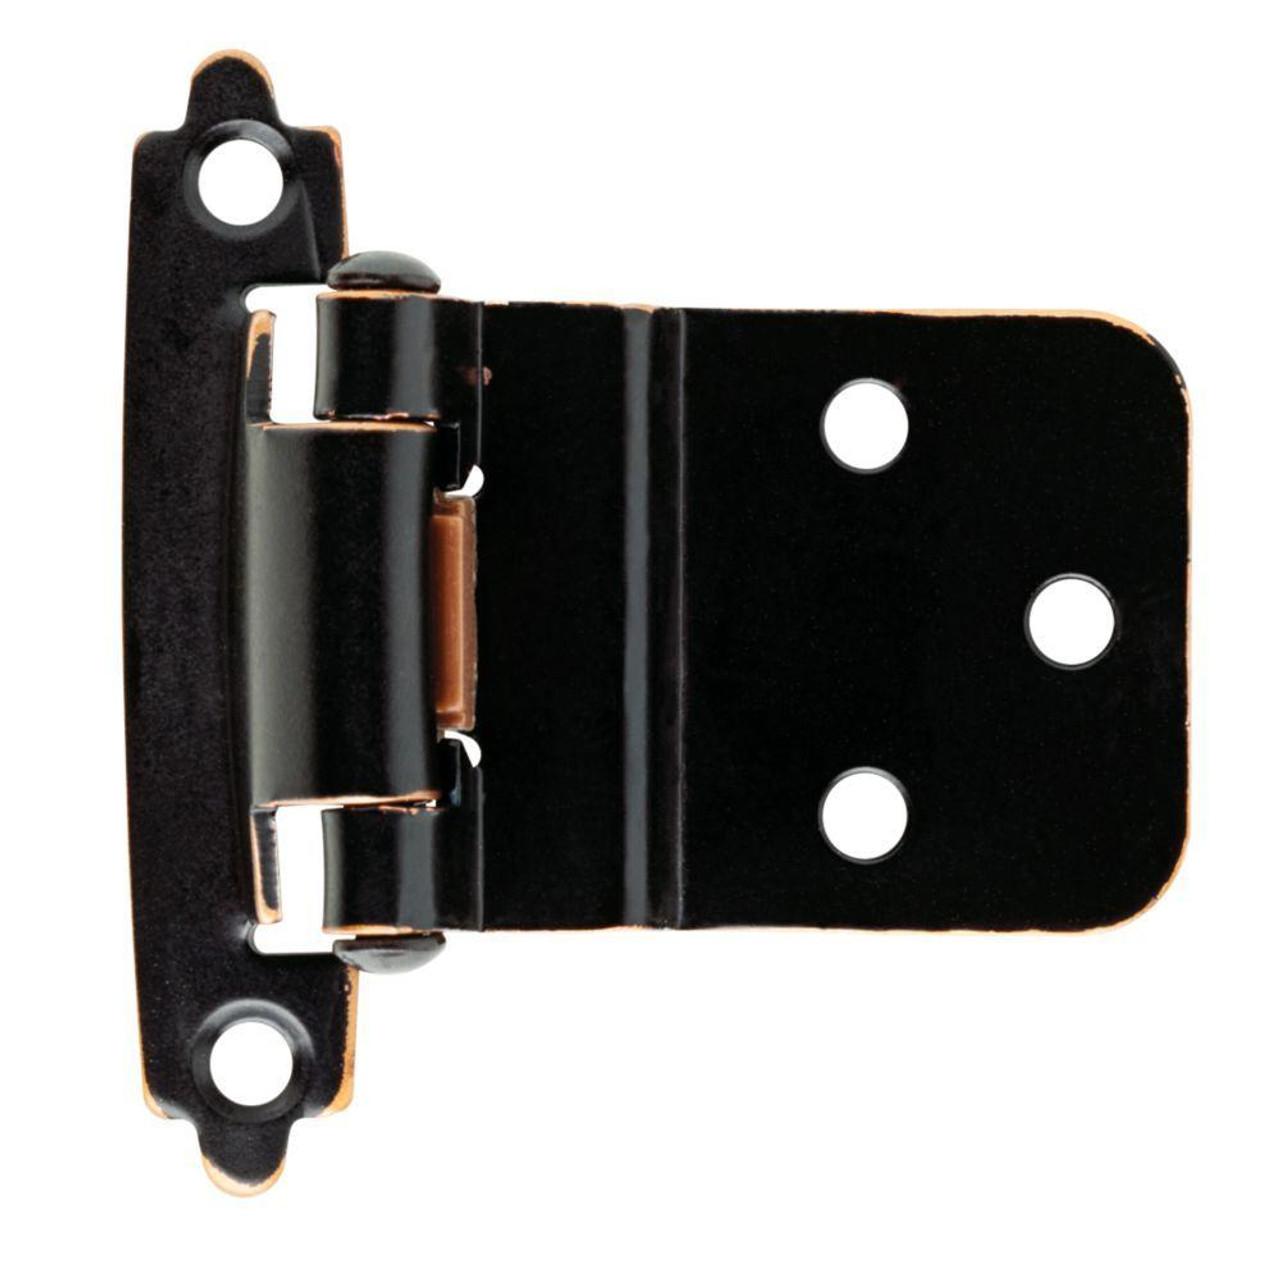 "H0104AC-VBC 3/8"" Self Closing Inset Hinge Bronze & Copper Set of 2"